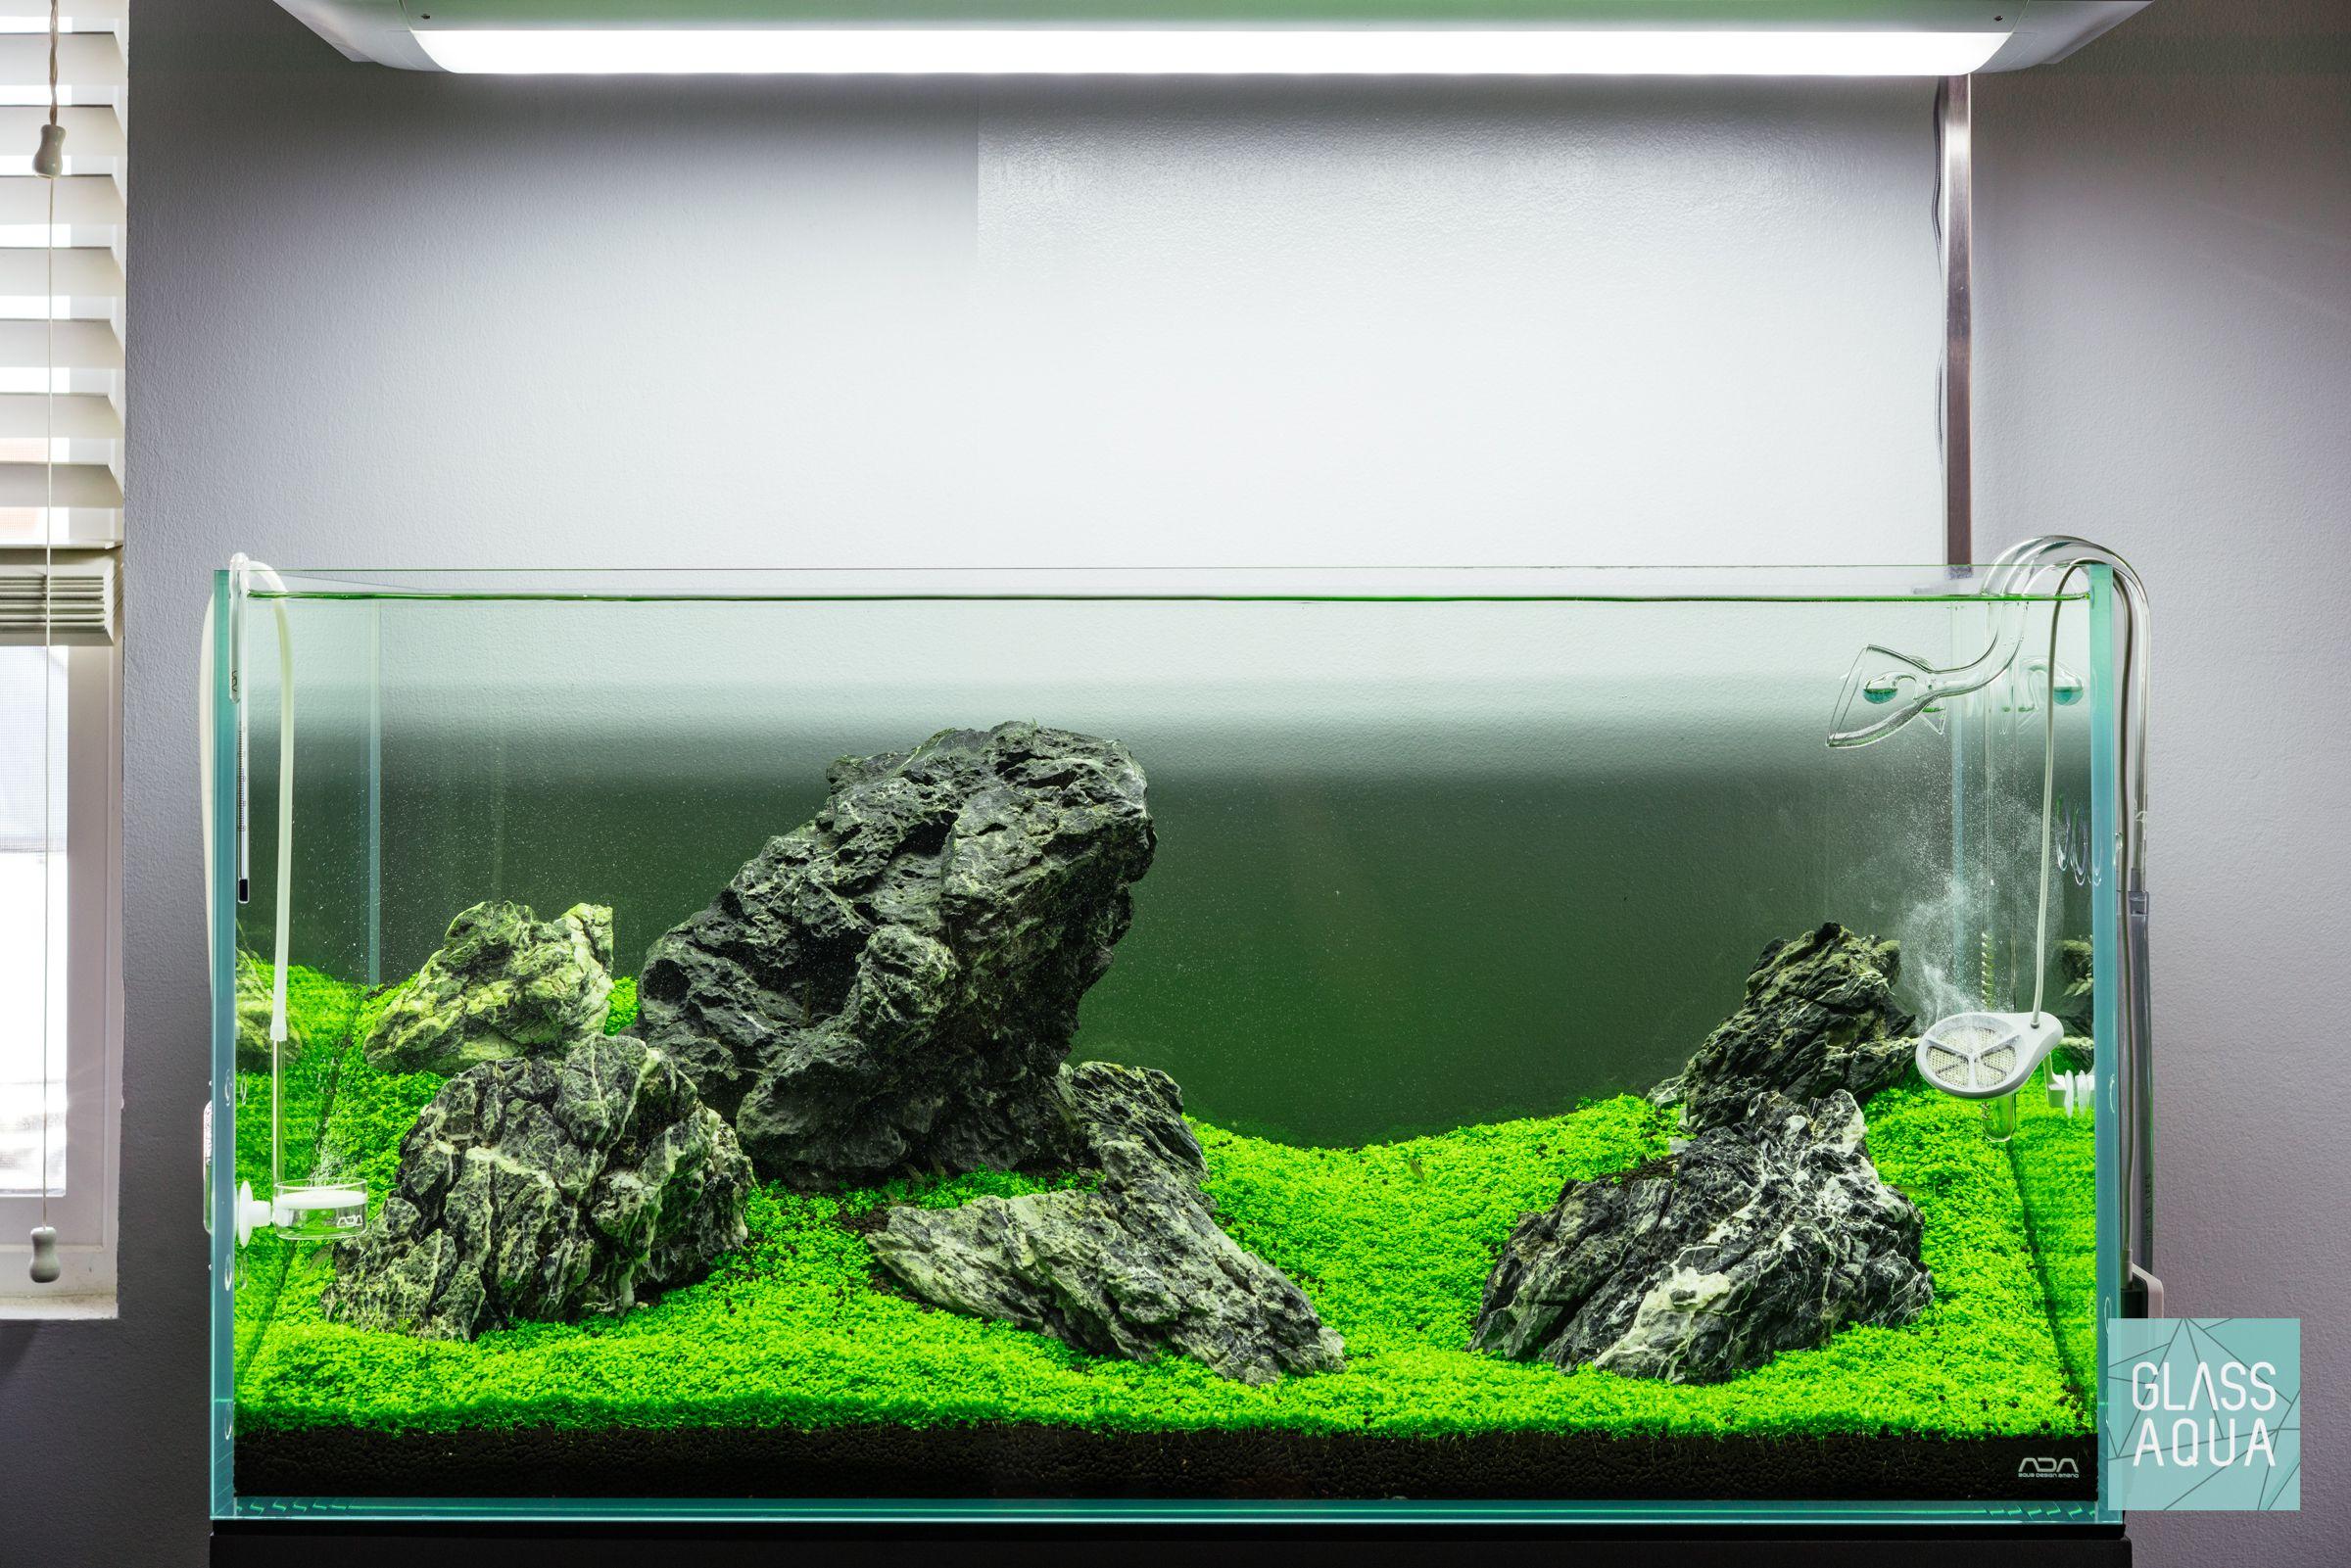 Fully Carpeted Iwagumi Aquascape Planted Aquarium Tank Aquarium Aquascape Aquarium Fish Tank Plants